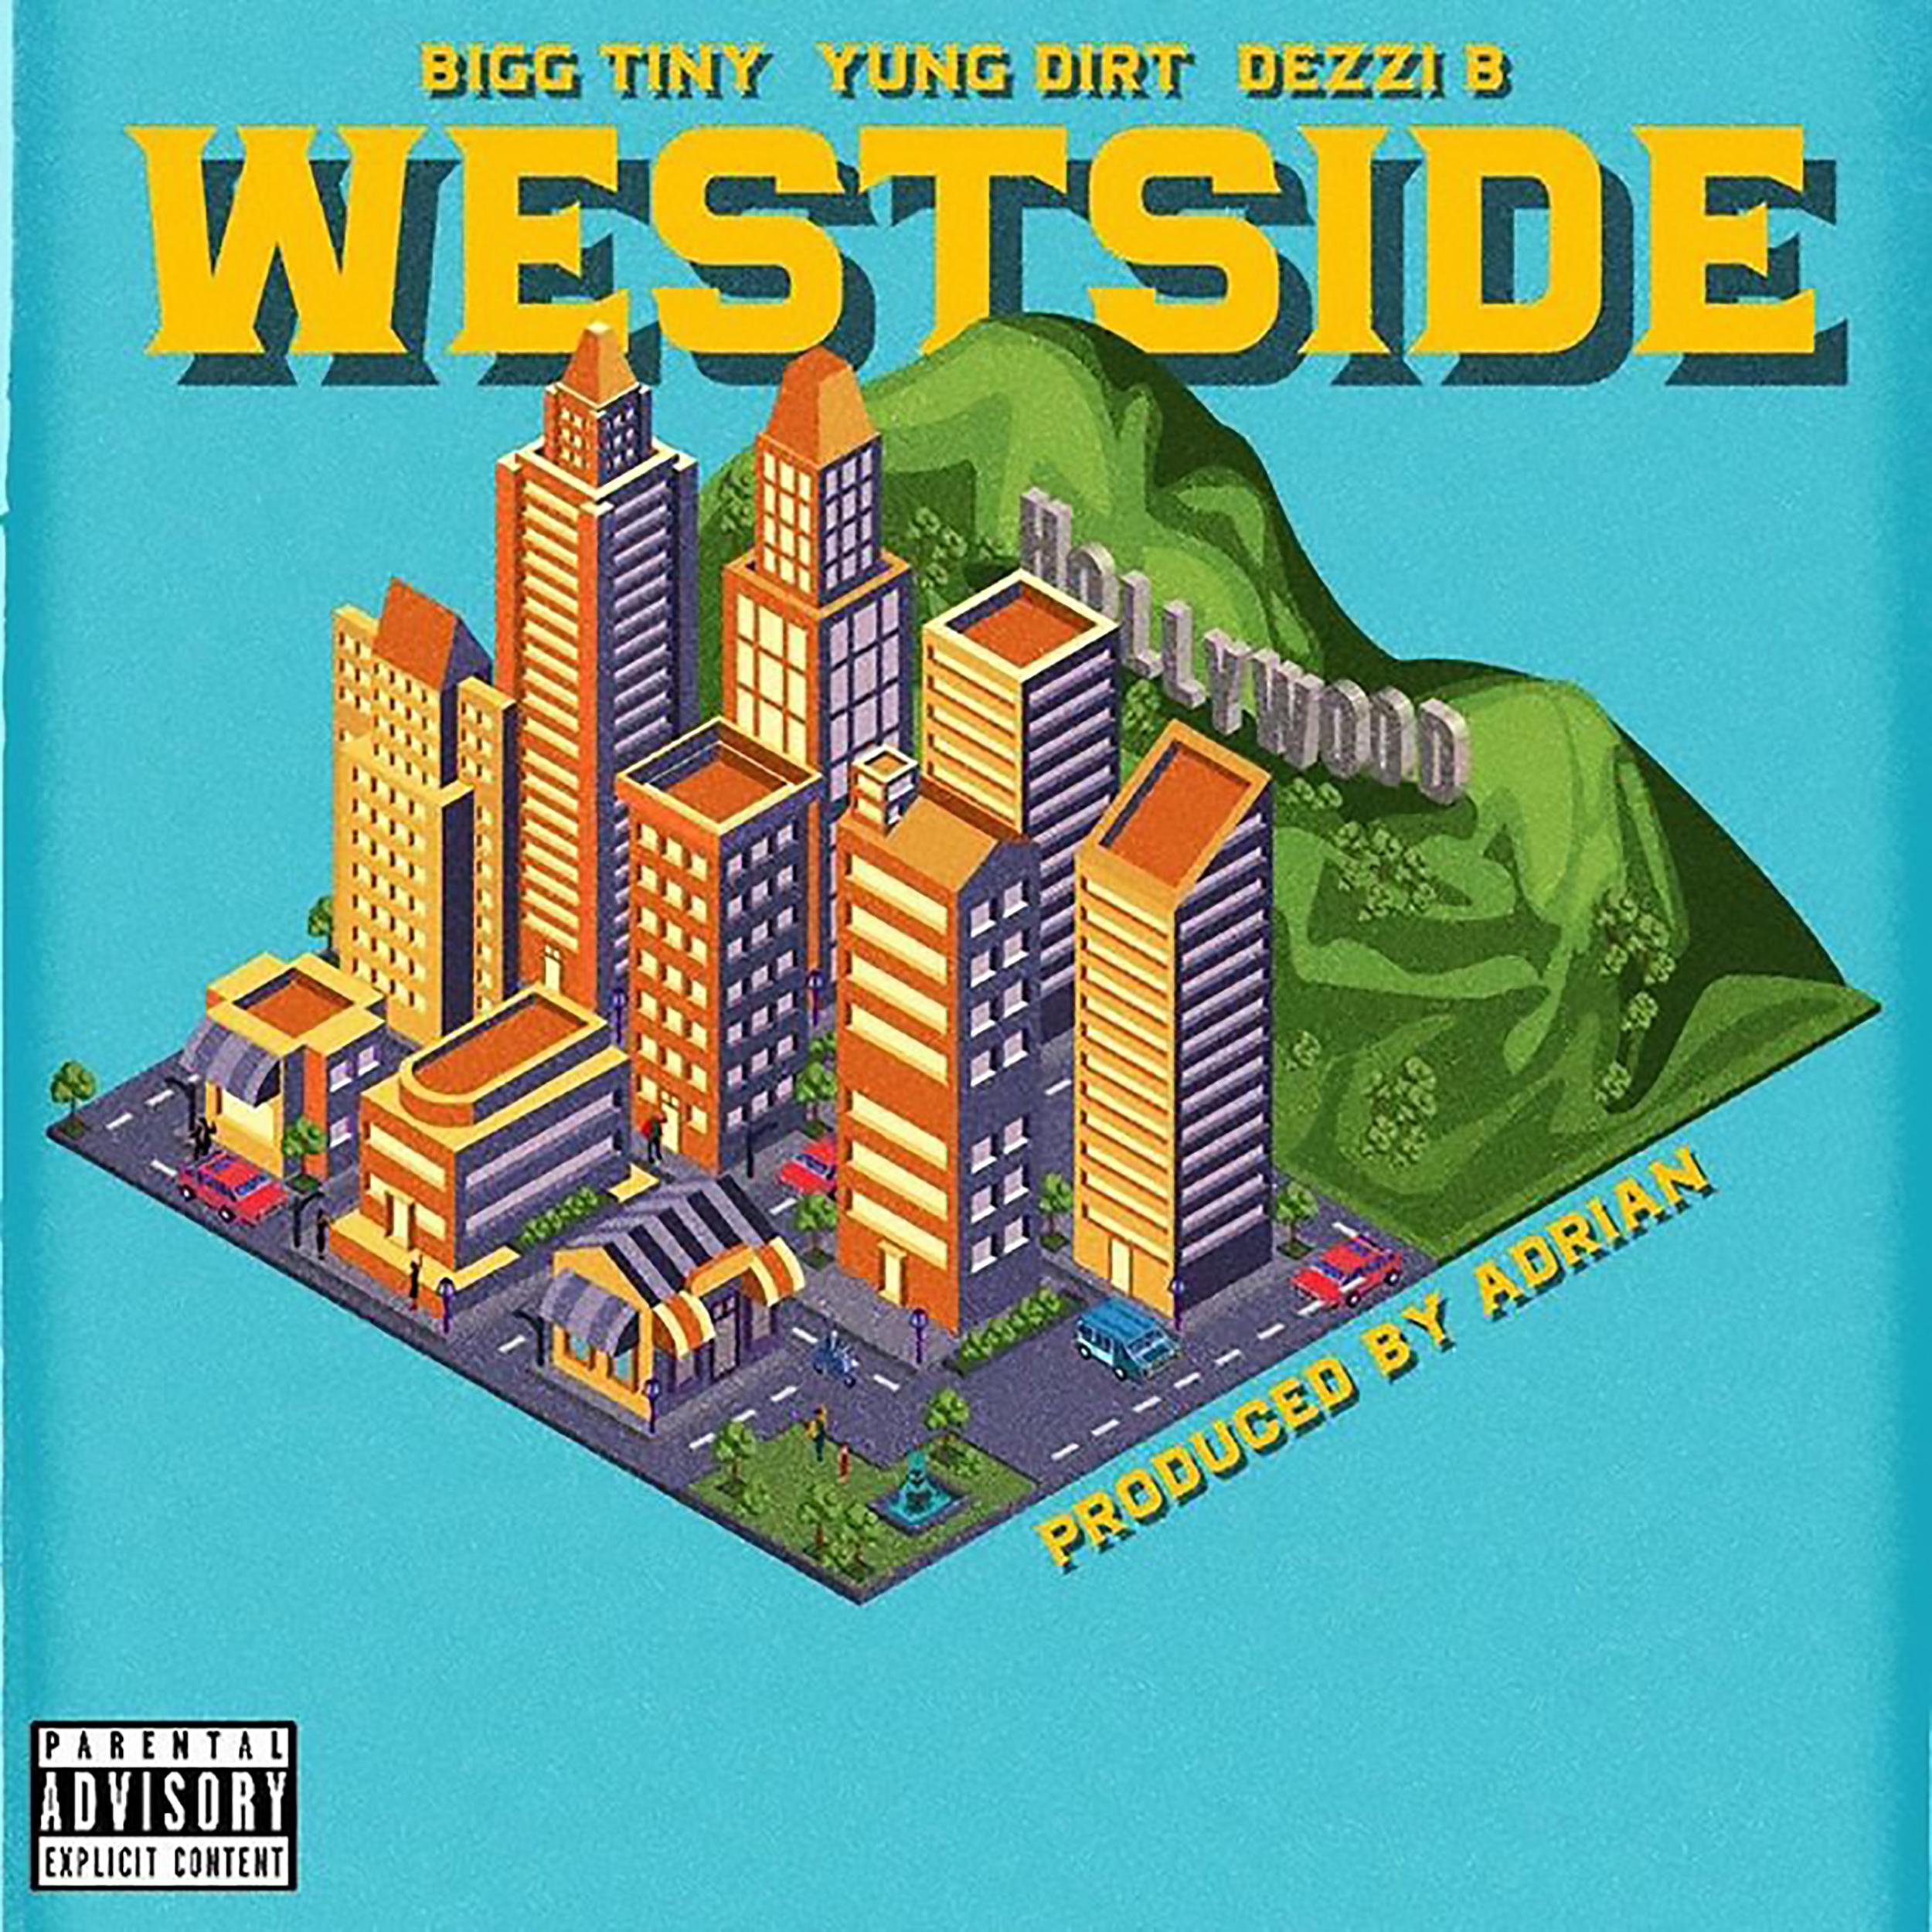 Bigg Tiny - West Side - Explicit Single.jpeg